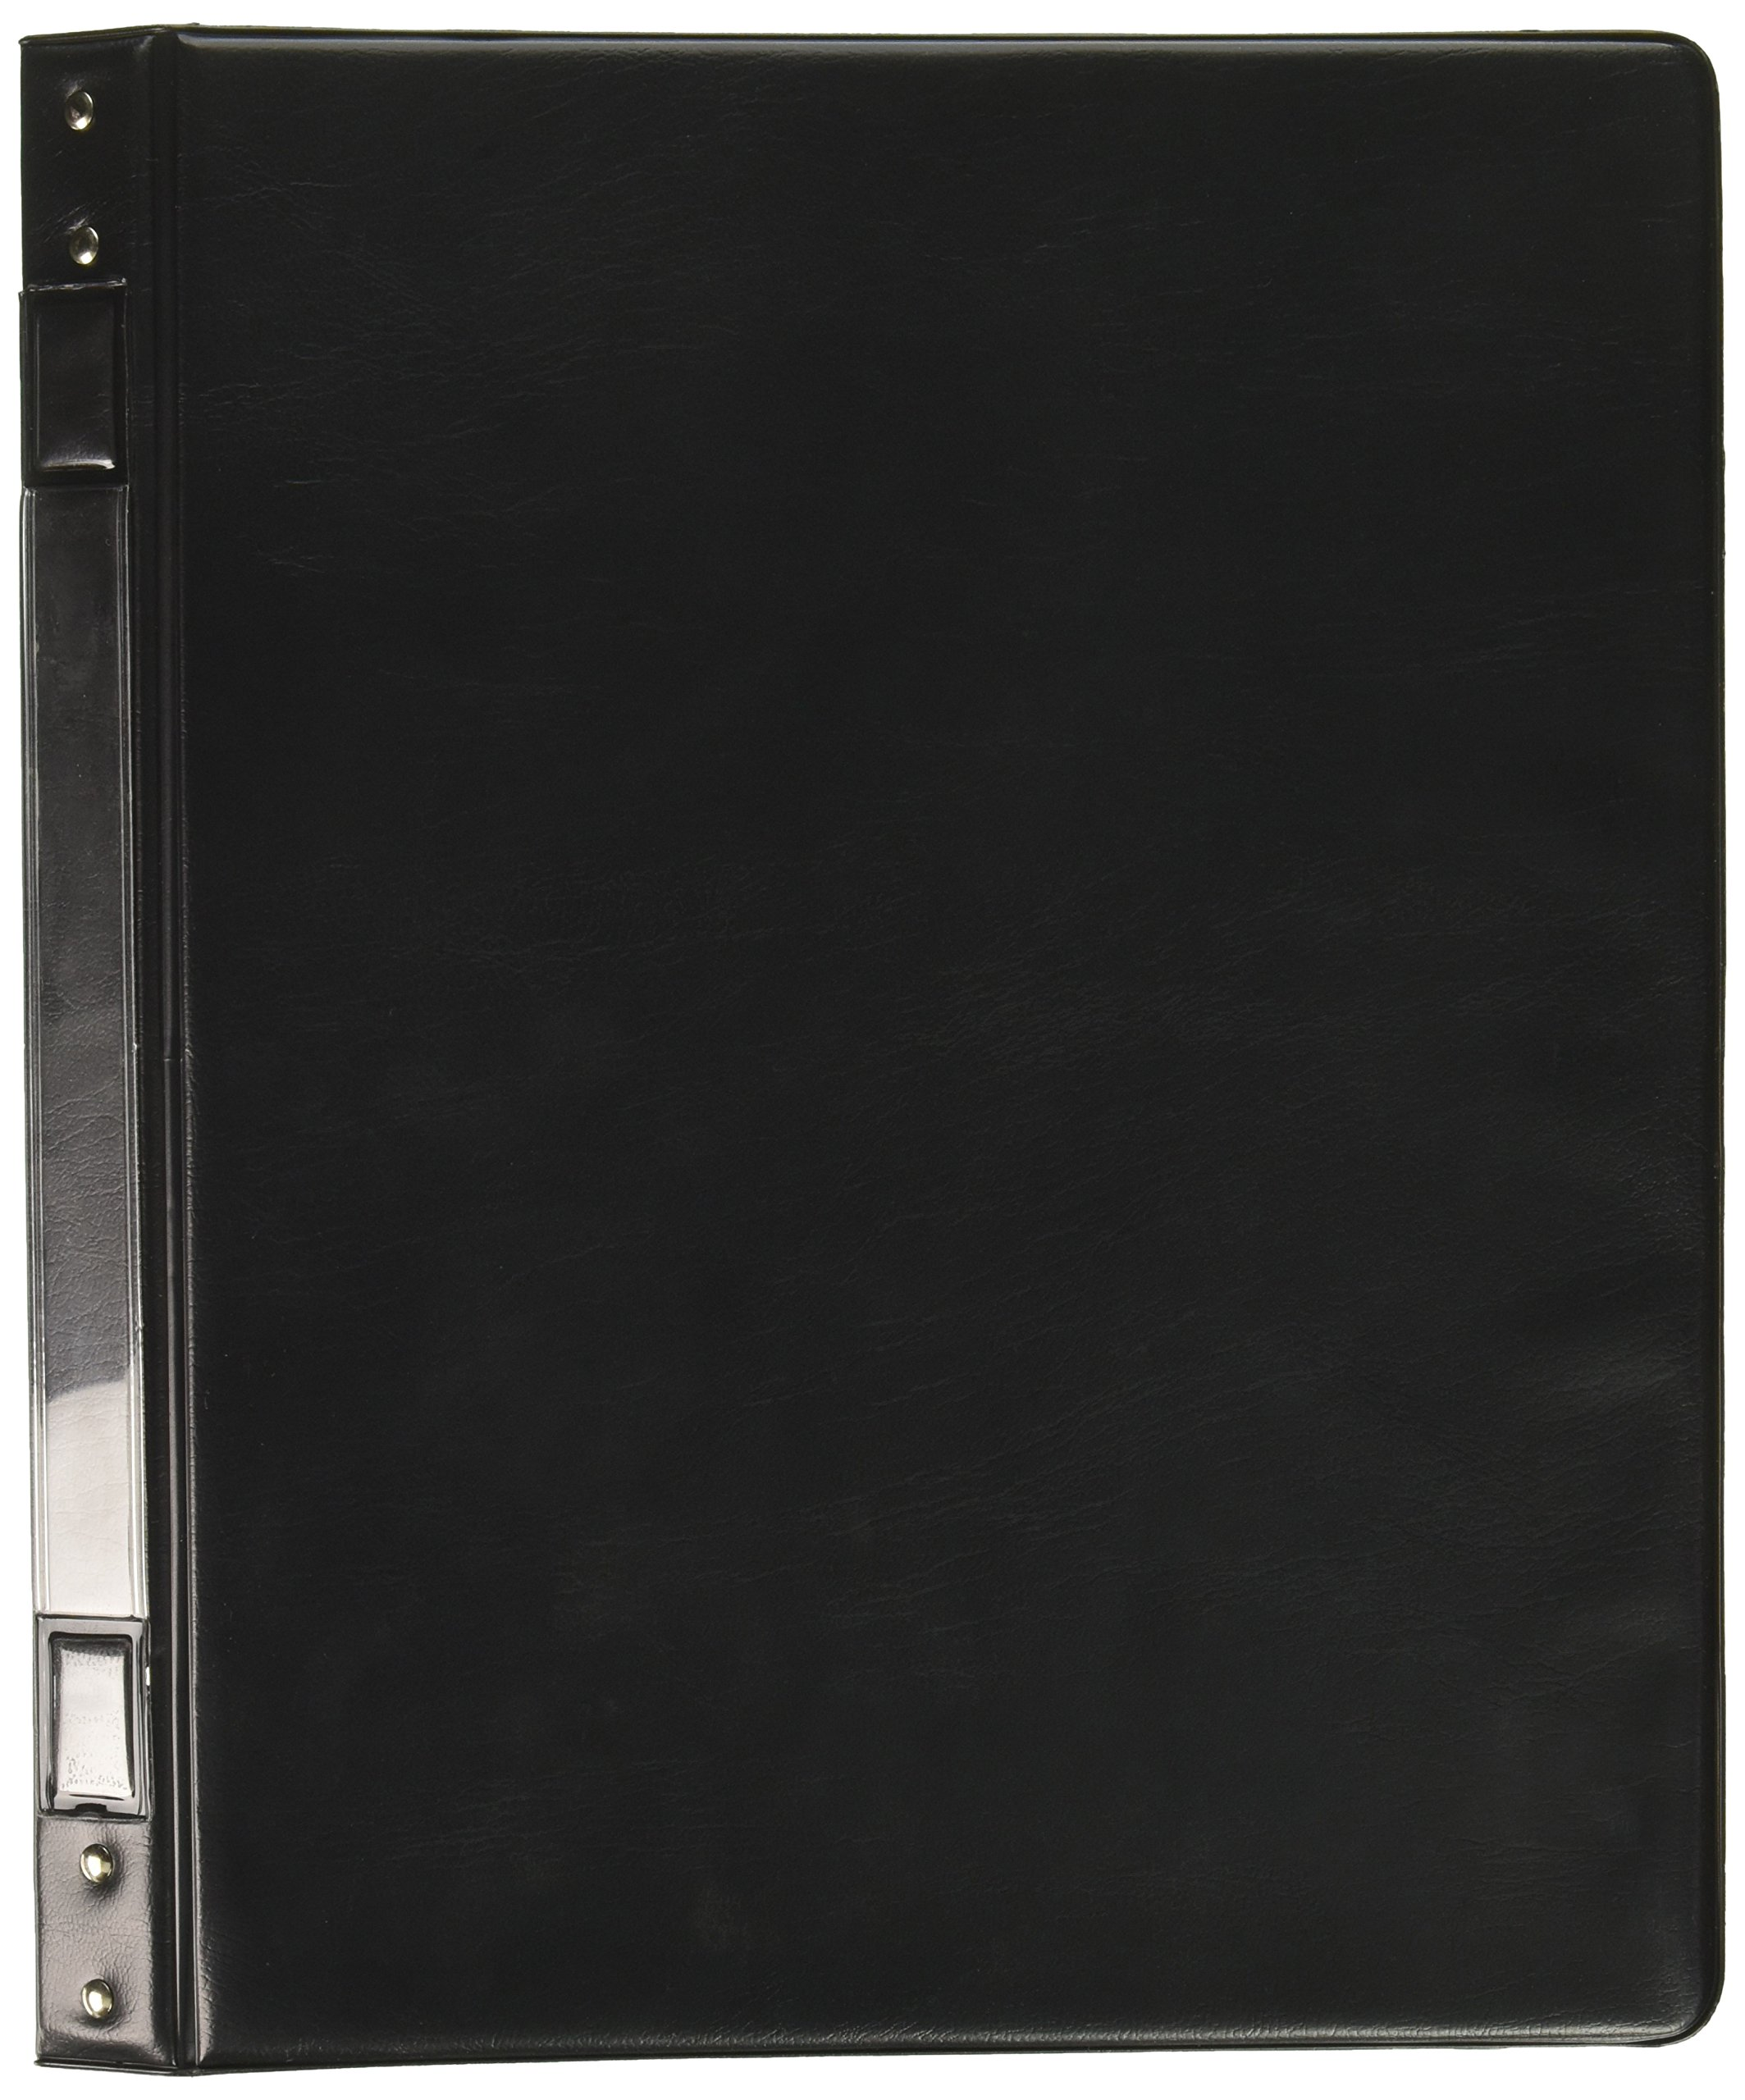 Manhasset Choral Music Folio Folder #1600